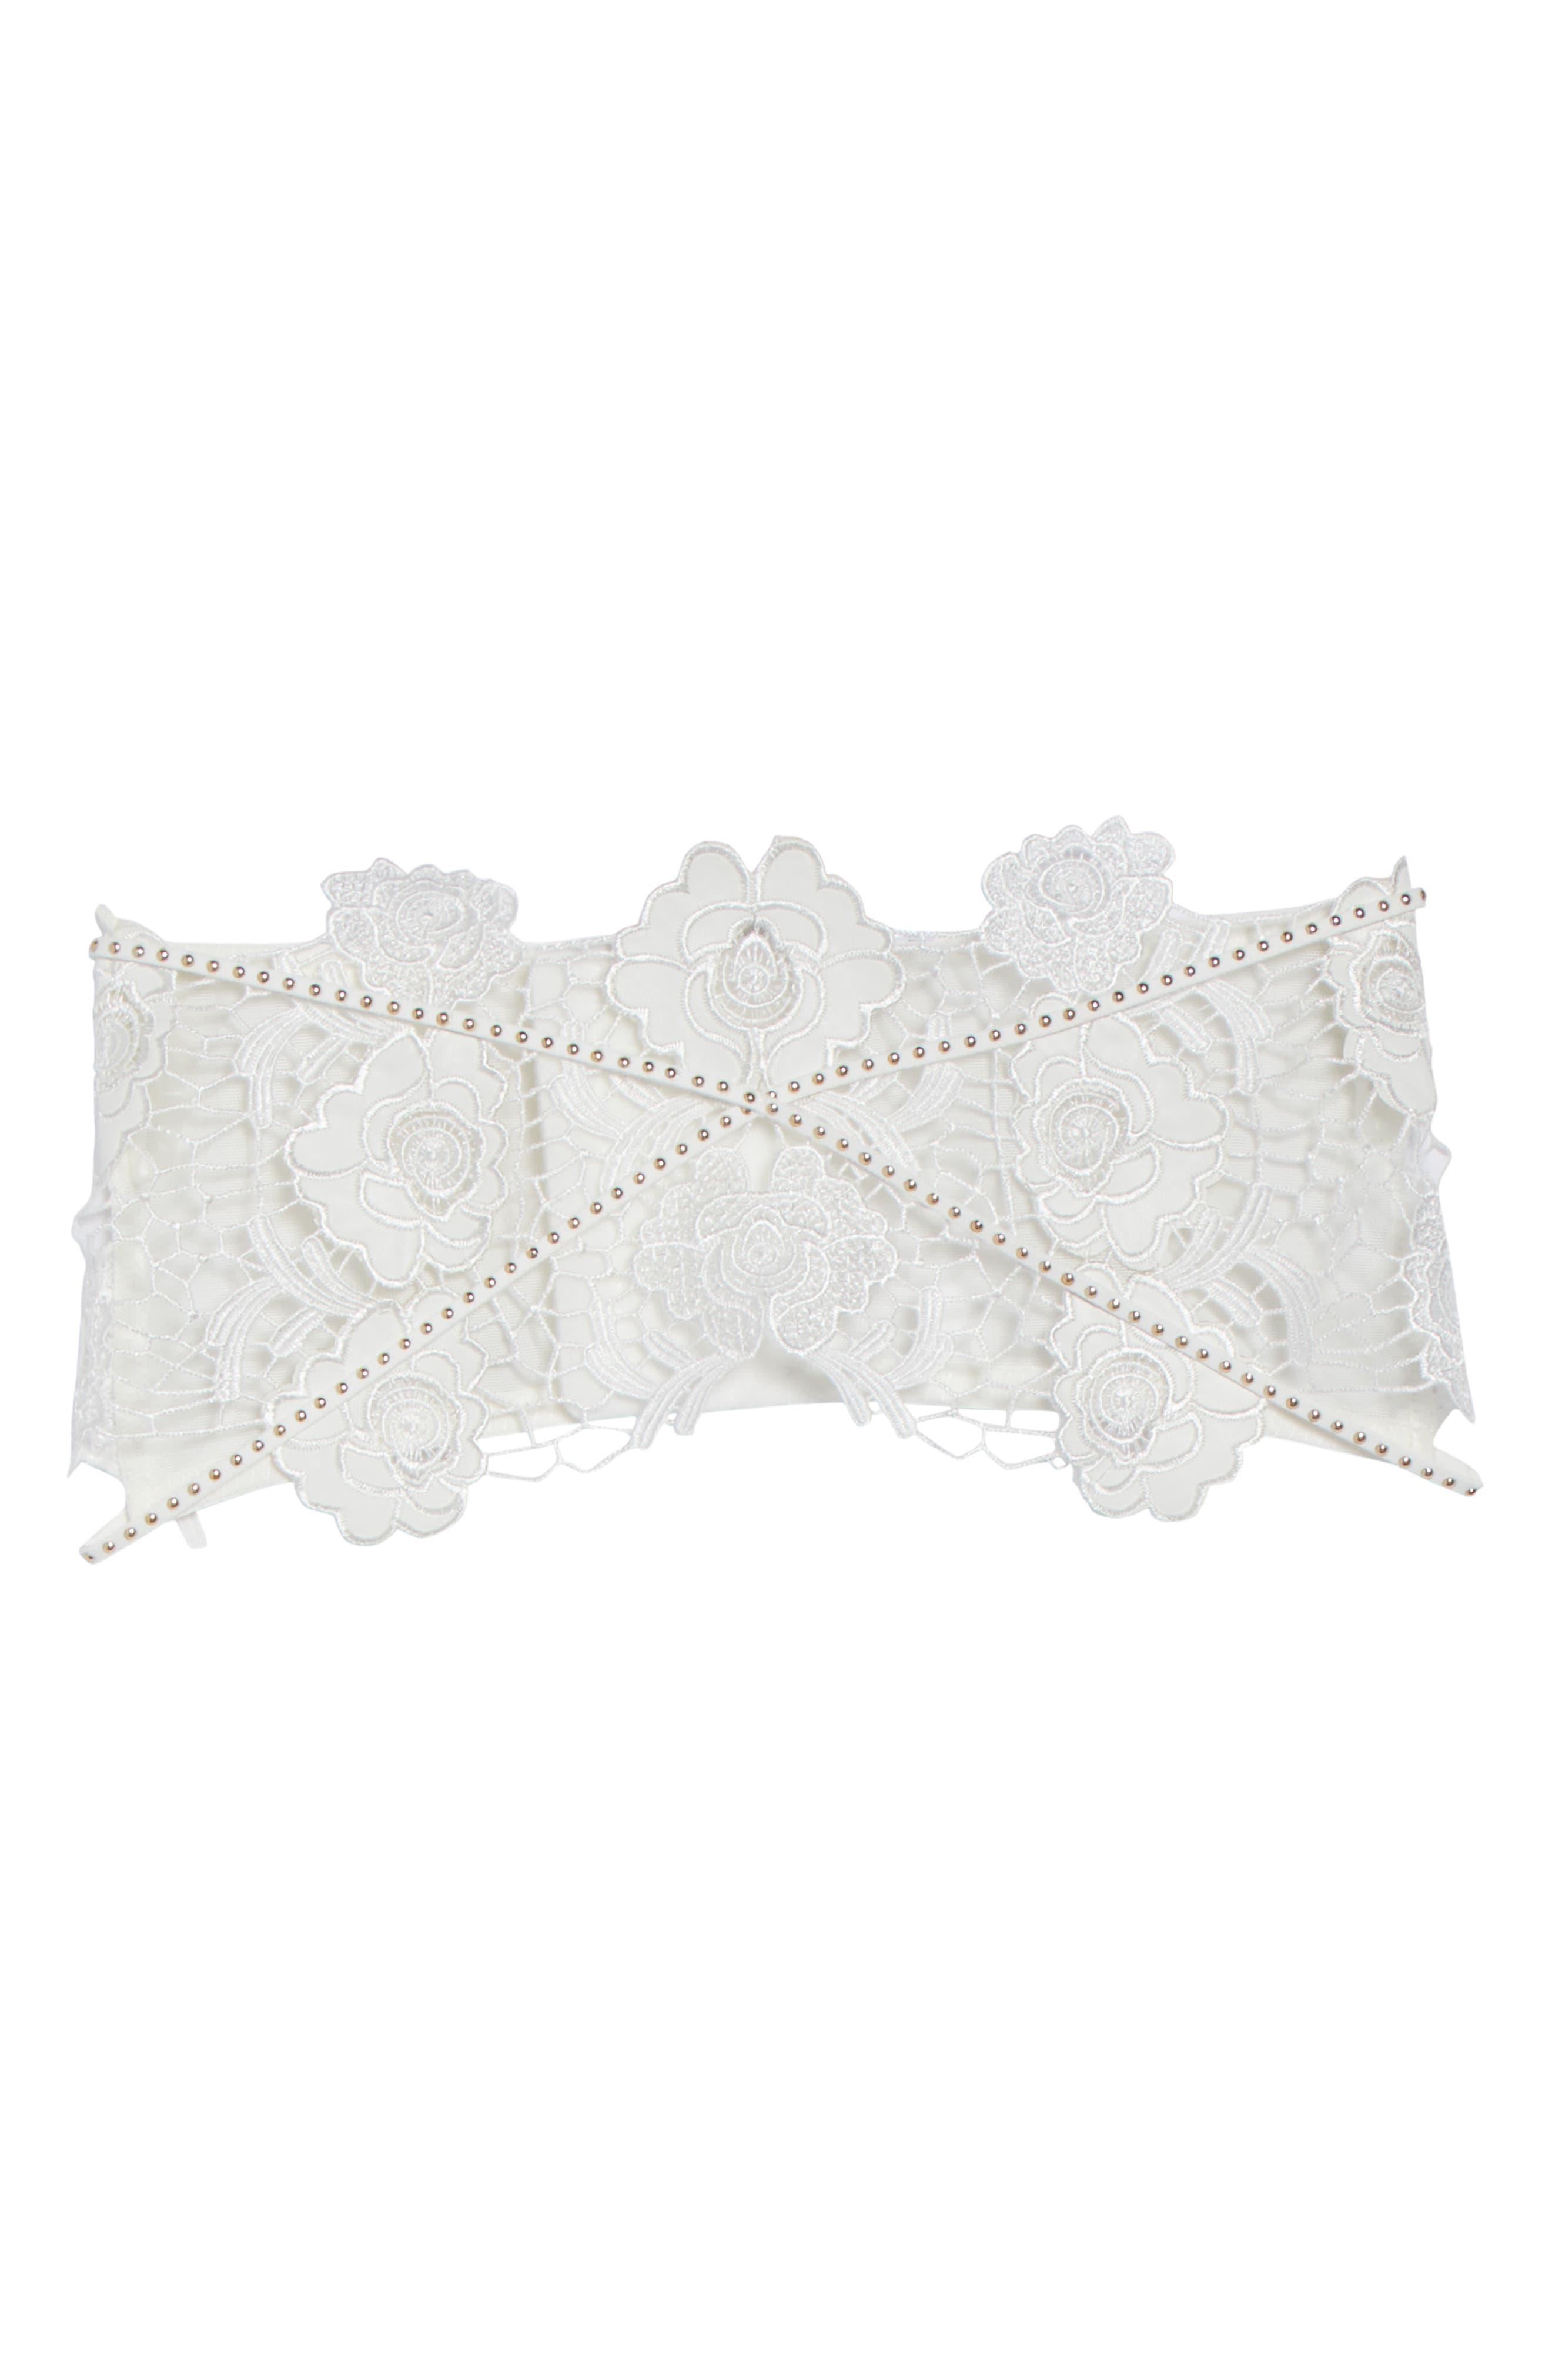 Tamara White Corset Belt,                             Main thumbnail 1, color,                             900